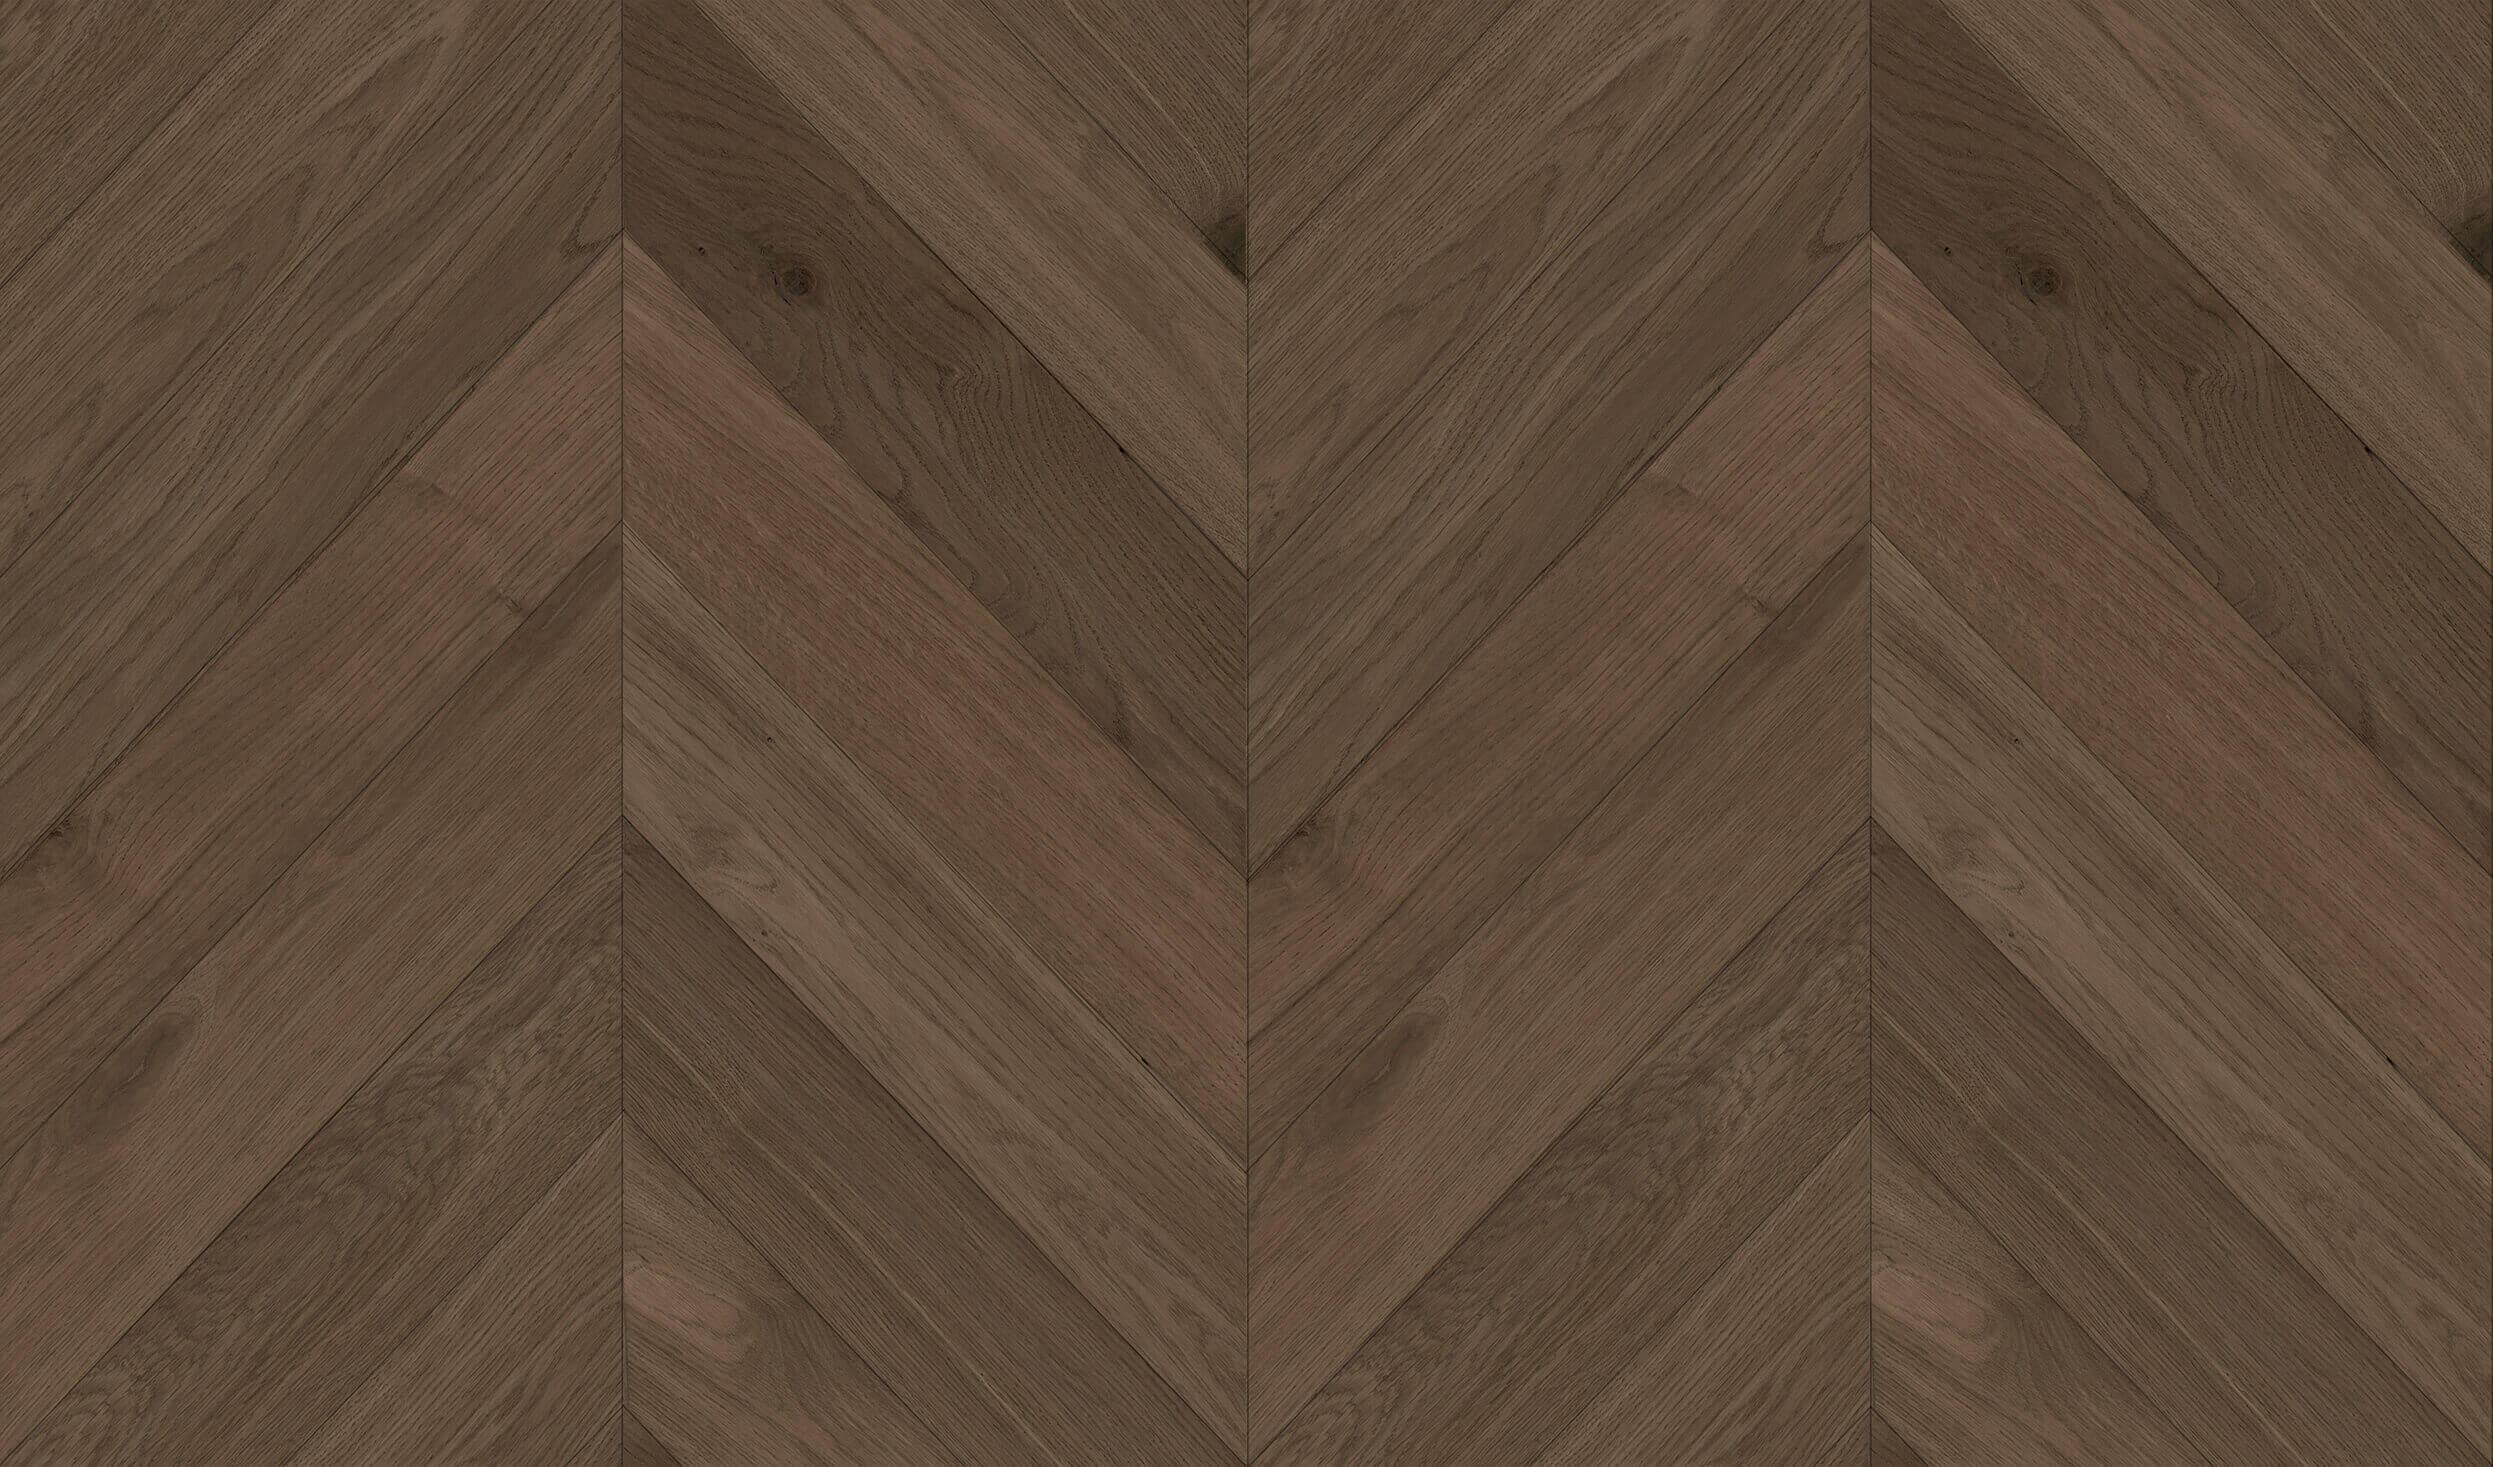 flooring shop, engineered timber flooring, engineered timber flooring sydney, engineered timber floors, engineered timber floor, timber floor engineered, timber flooring sydney, timber floor sydney, oak floor, oak flooringoak flooring sydney, chevron timber flooring